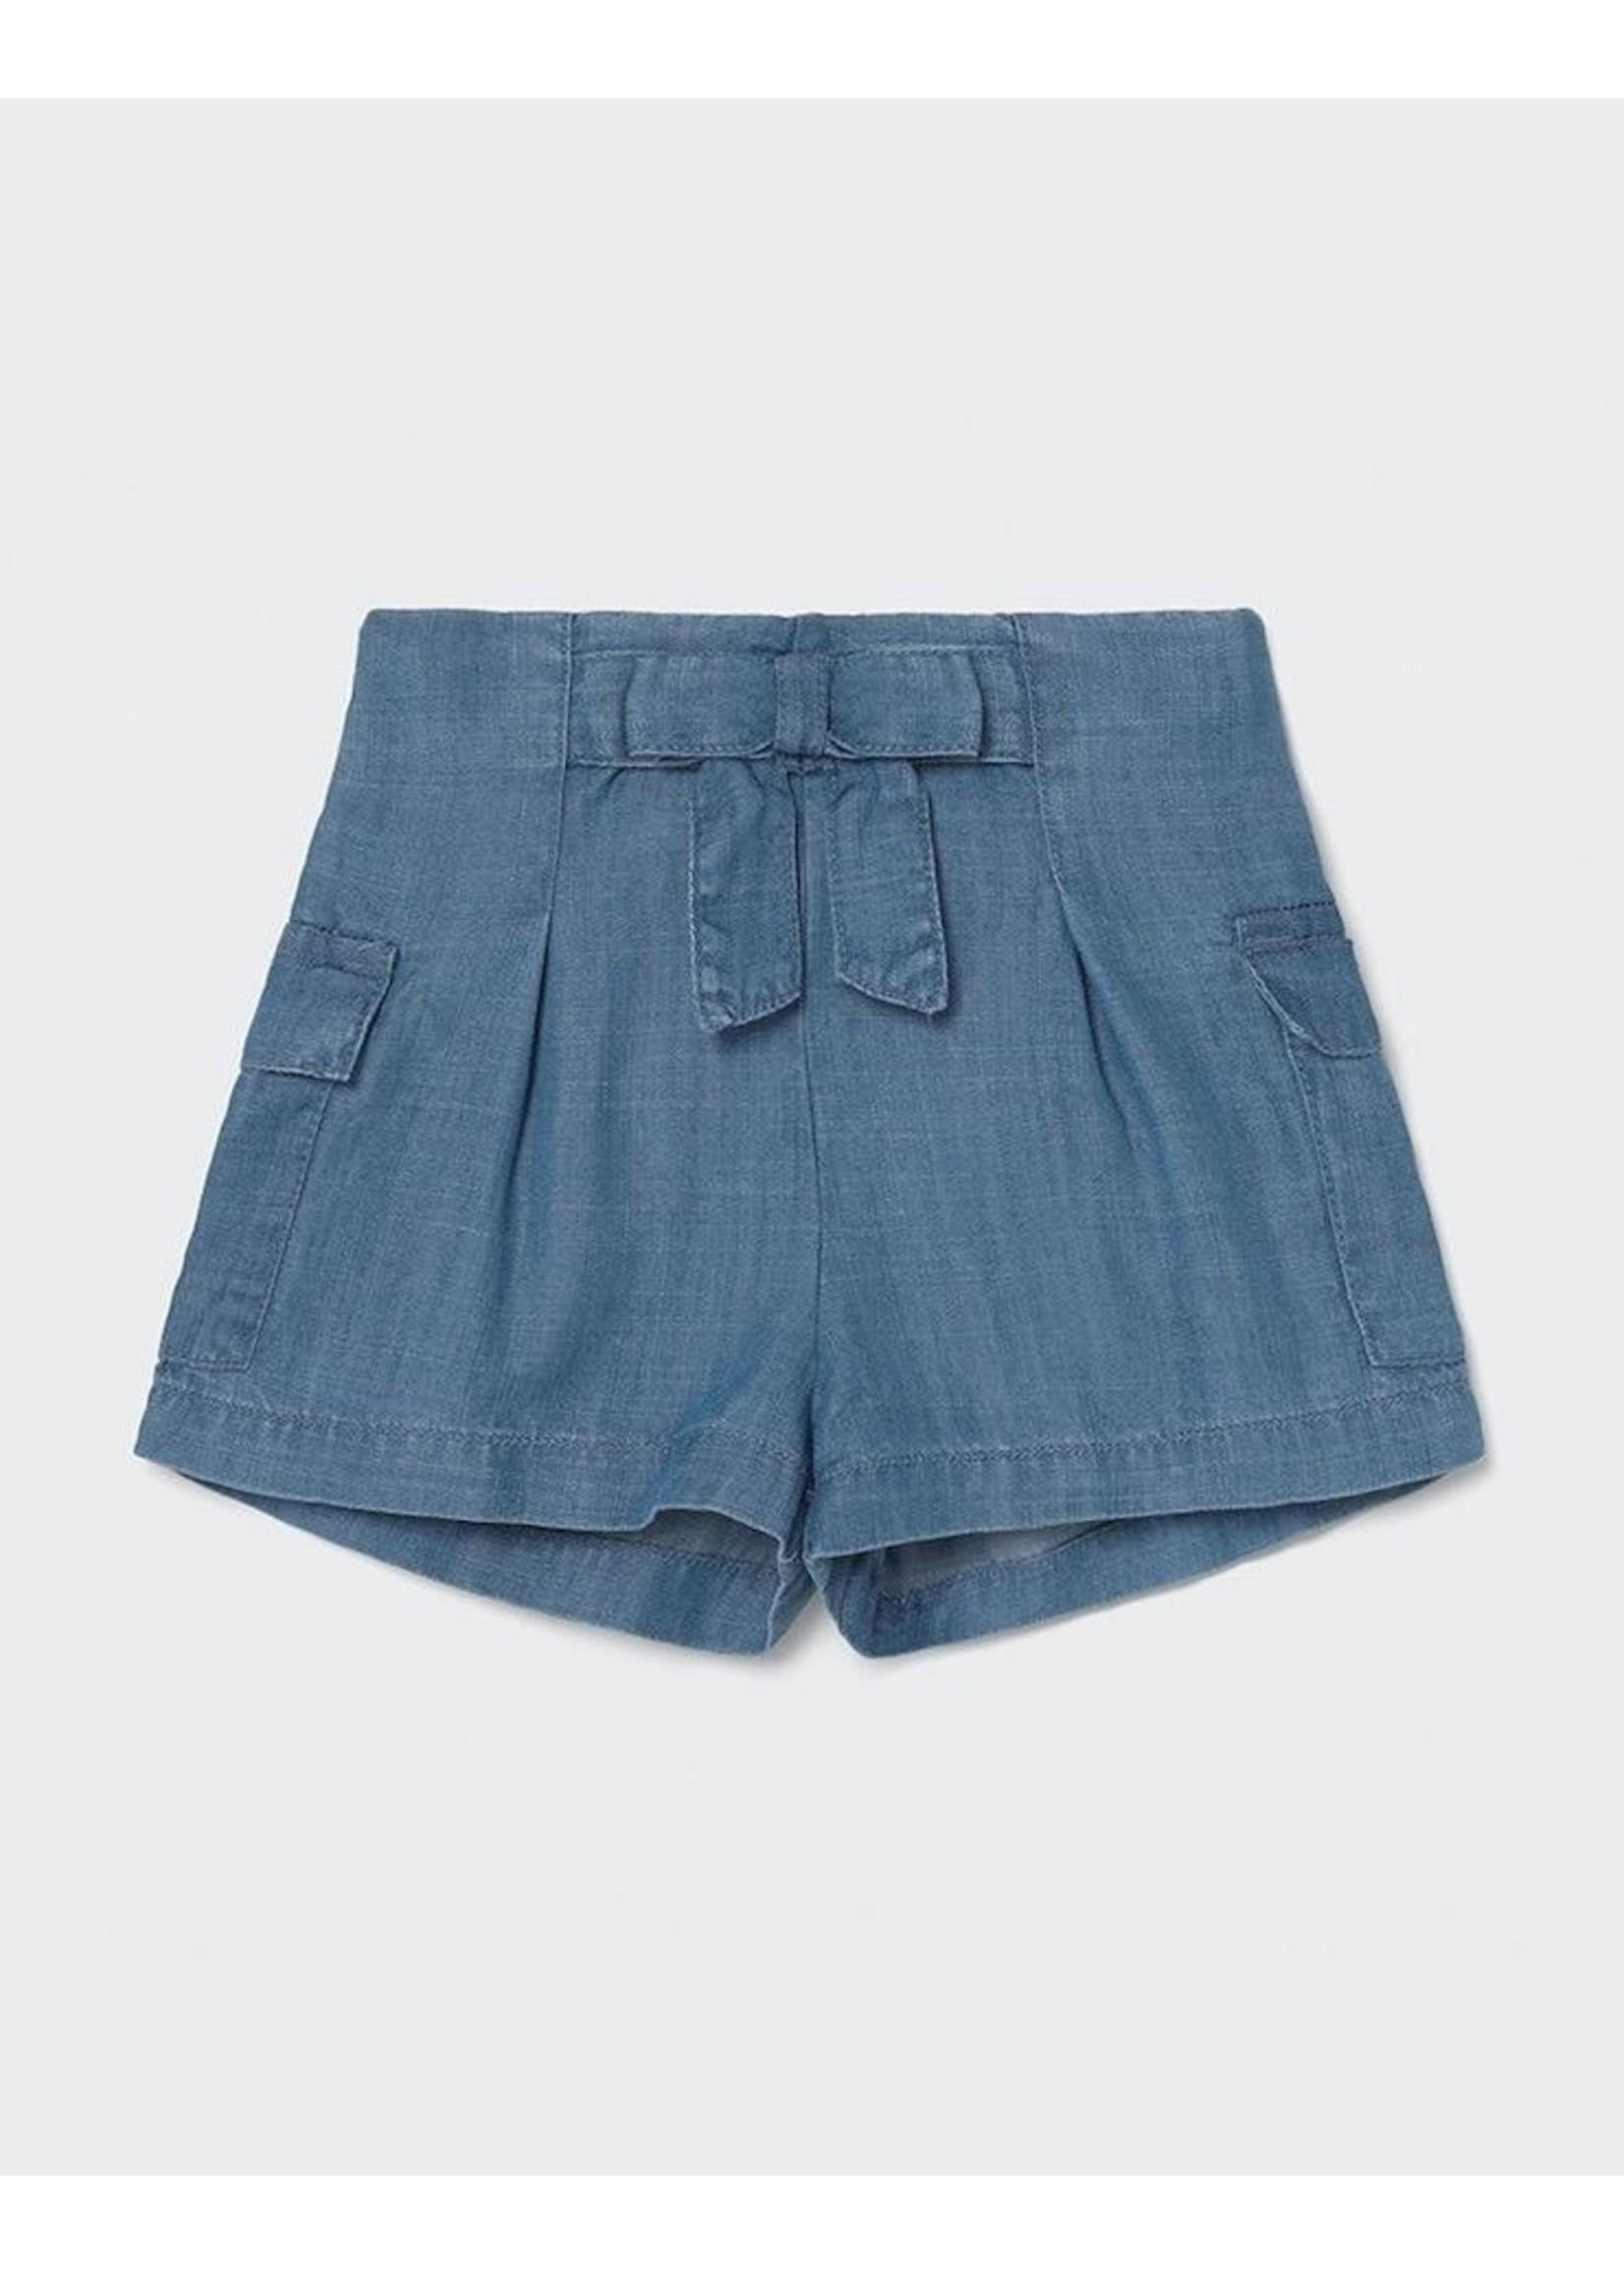 Mayoral Mayoral, Ecofriends Loose Denim Baby Shorts